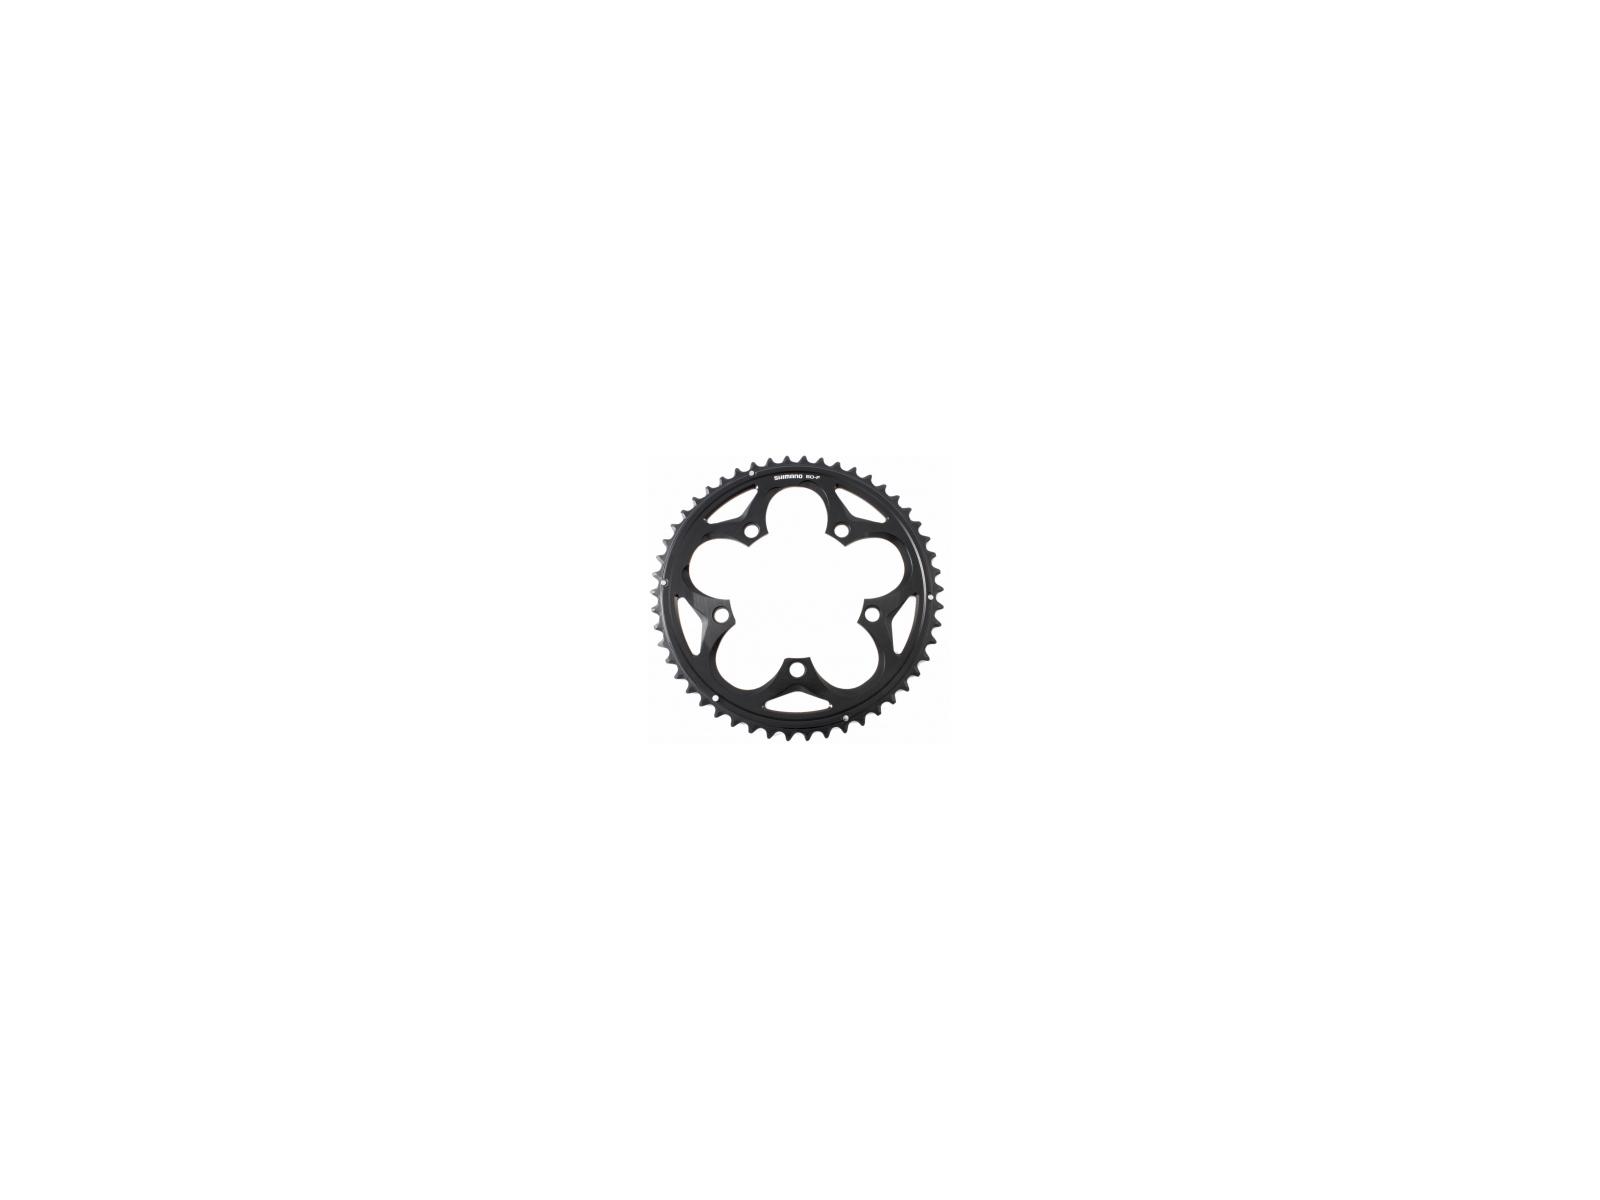 Klinger BCD/Fixmål 110 5 bolt